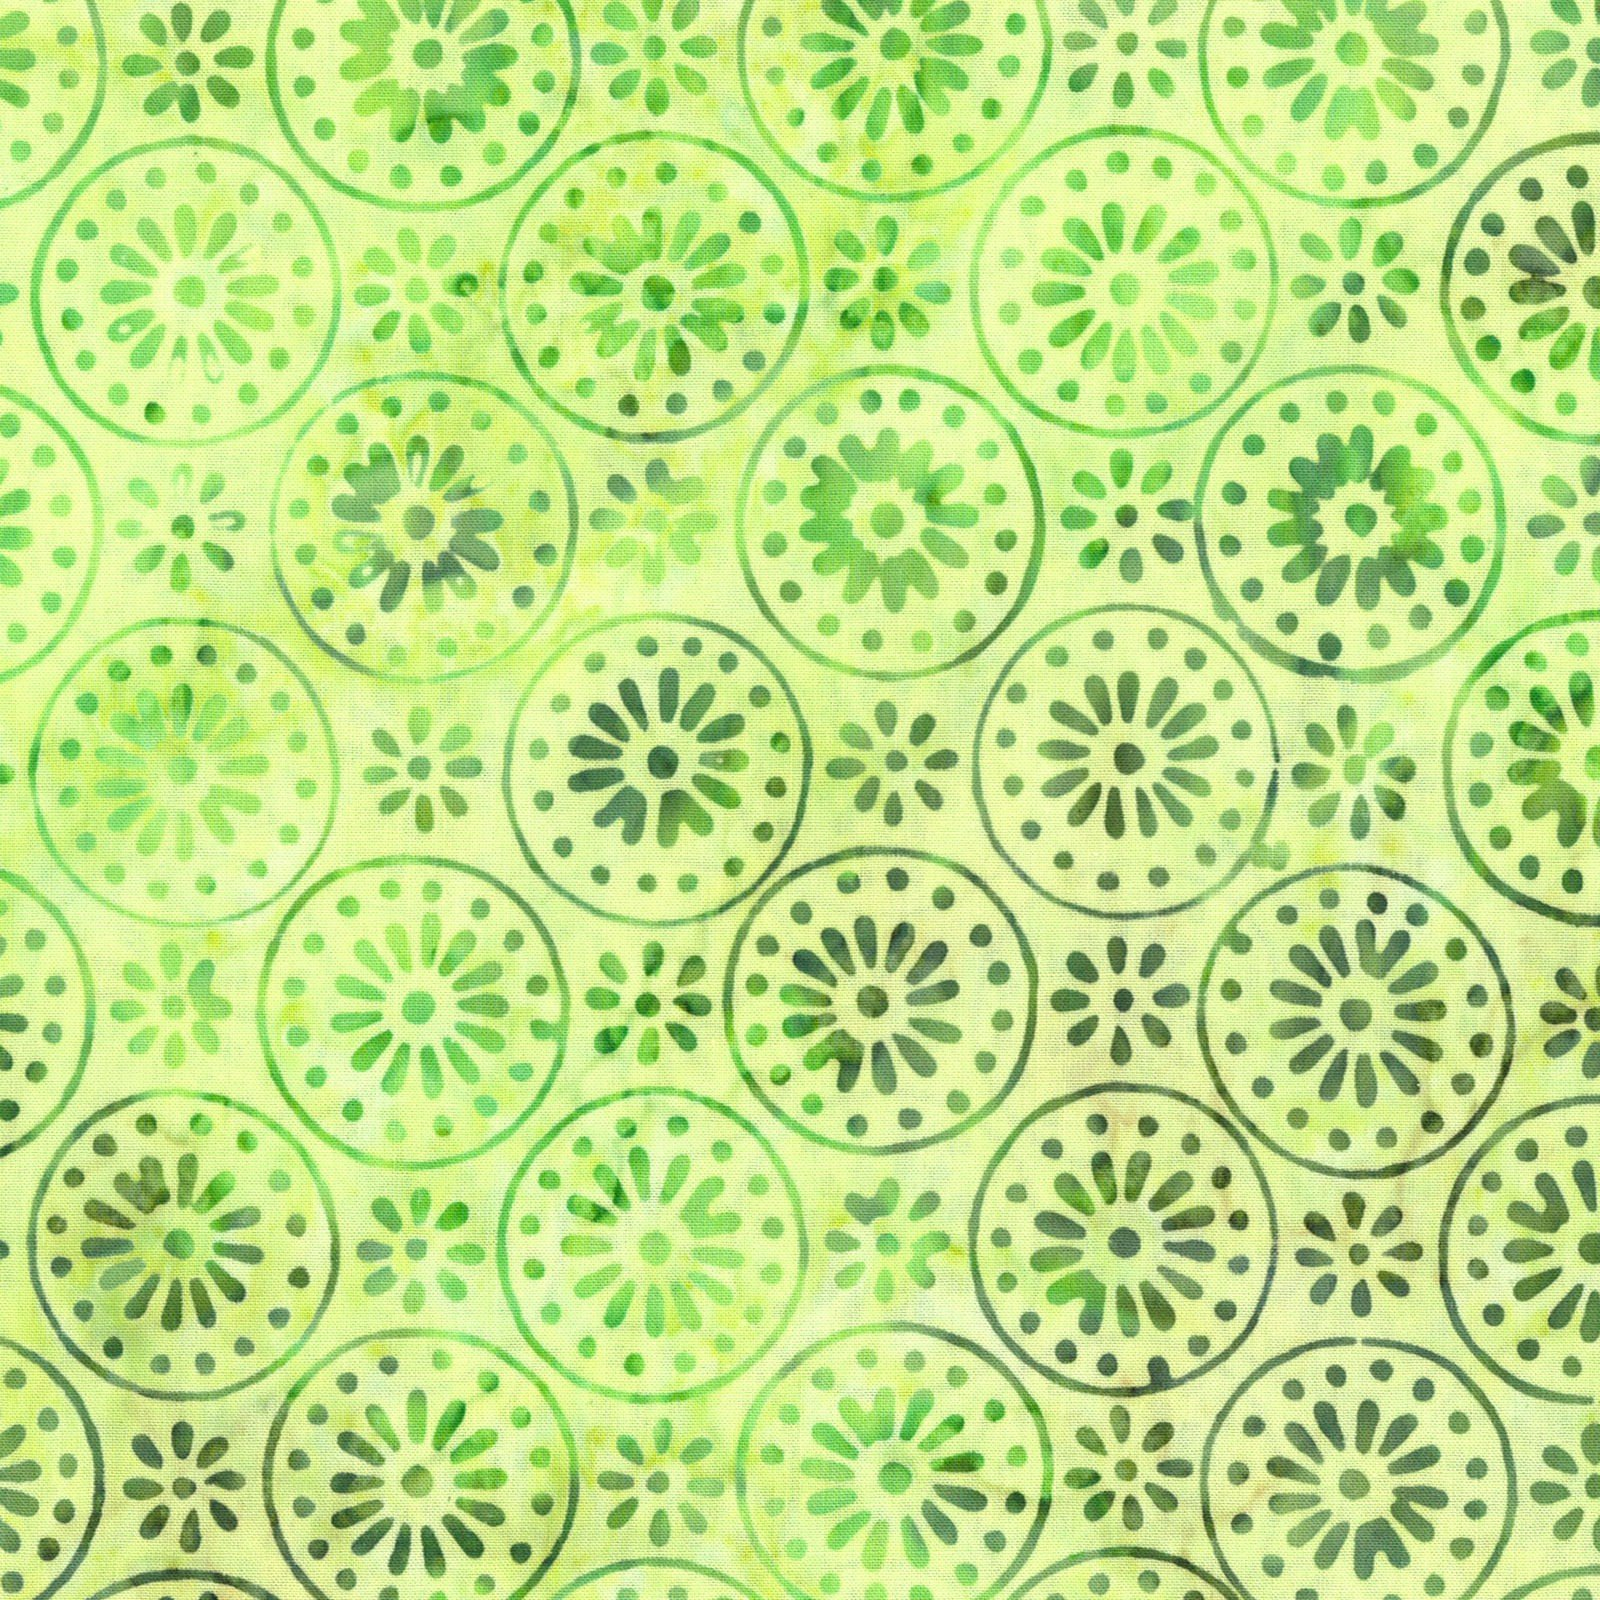 Floragraphix Batik IV Green<br/>In The Beginning 5GBD-2